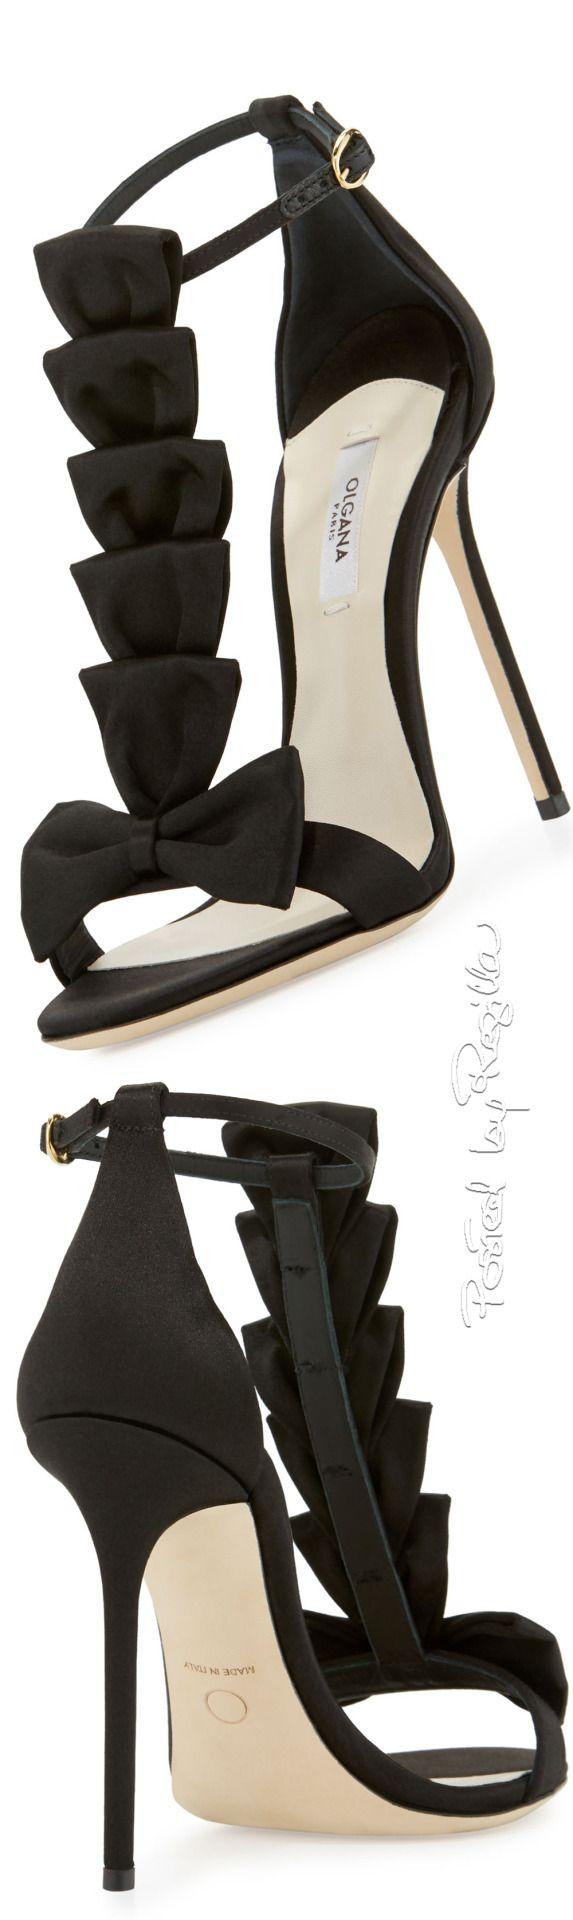 Regilla ⚜ Olgana, La Délicate Bow T-Strap Sandal